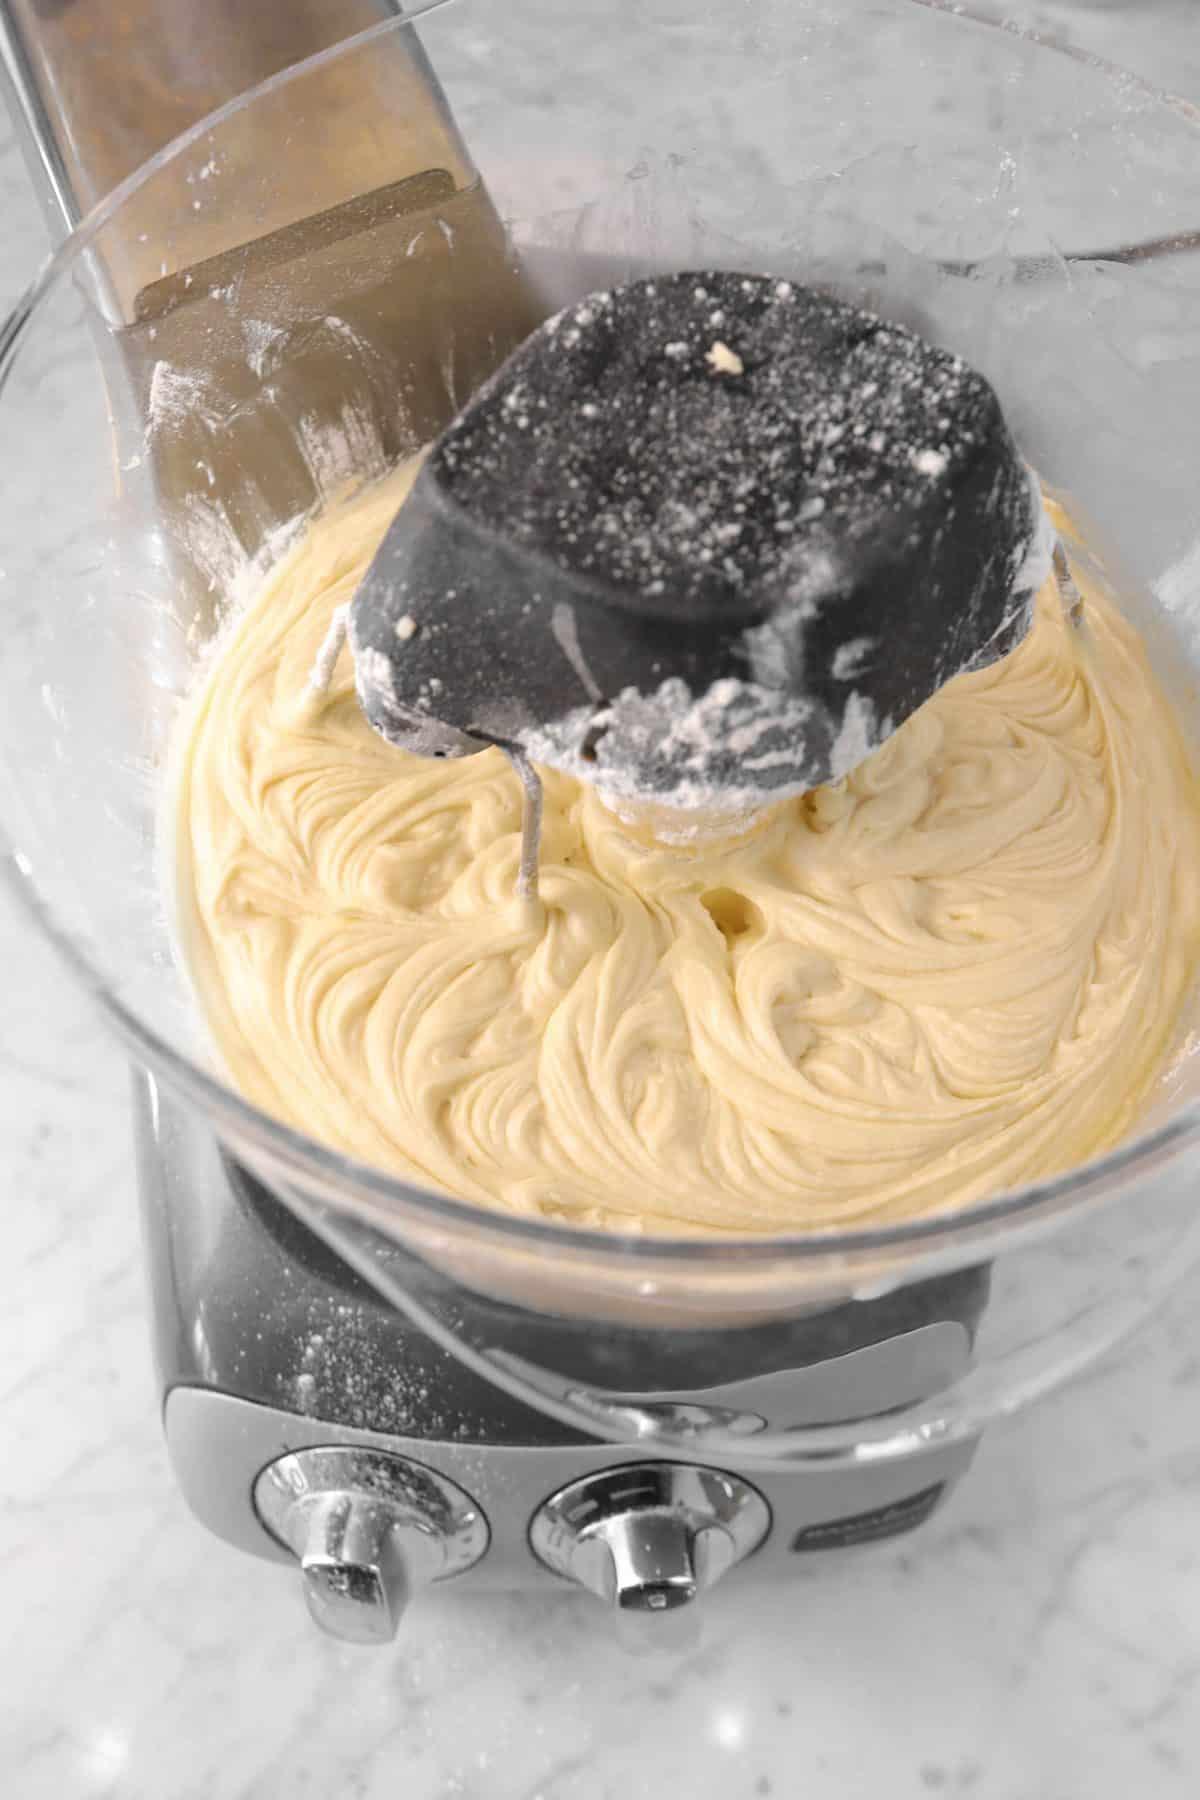 vanilla stirred into cake batter